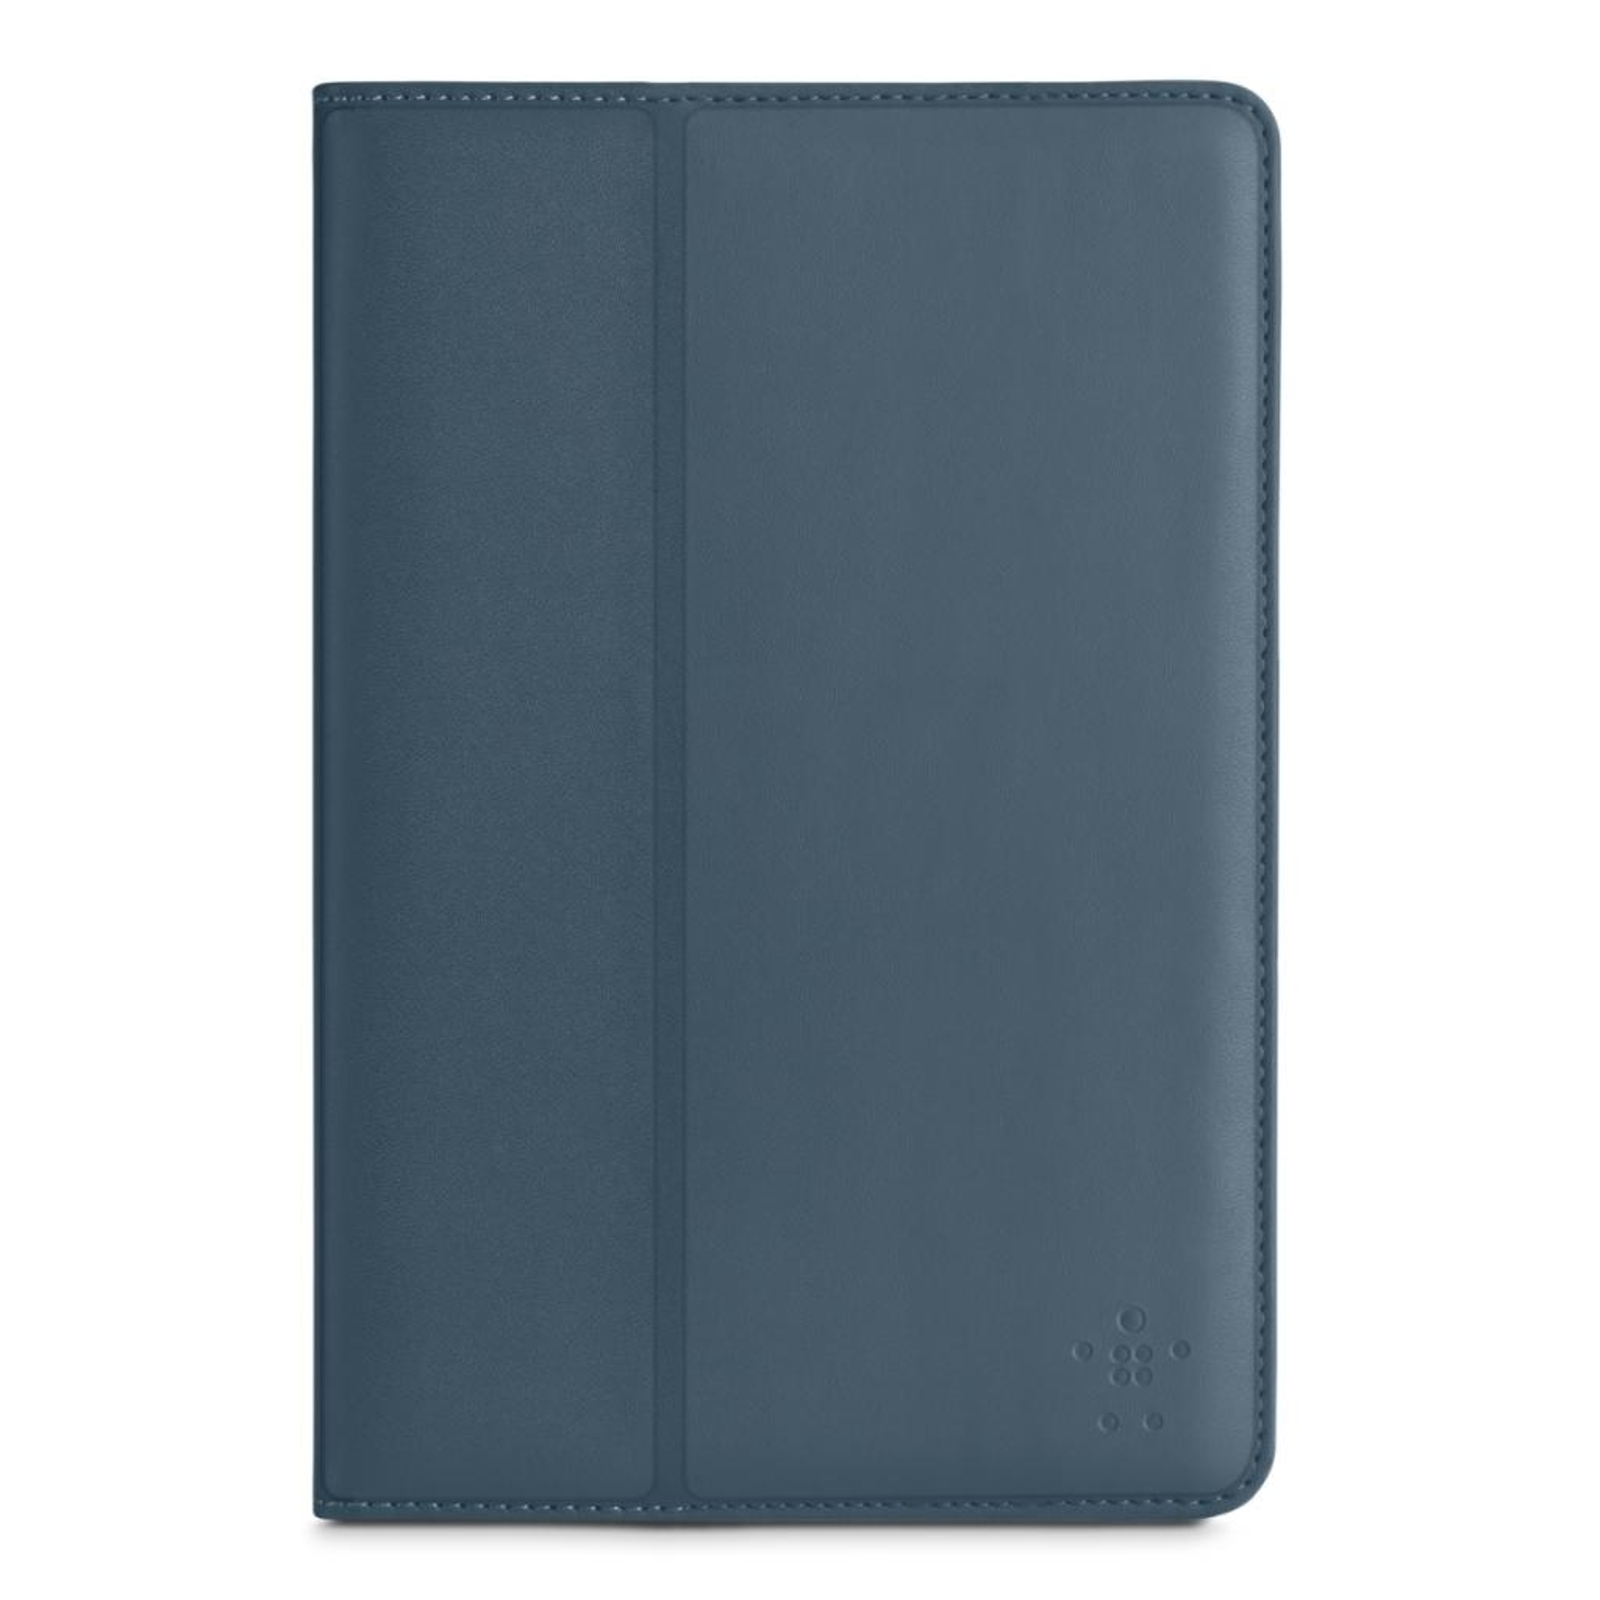 Чехол для планшета Belkin 7 GalaxyTab3 FormFit Stand blue (F7P114vfC01)